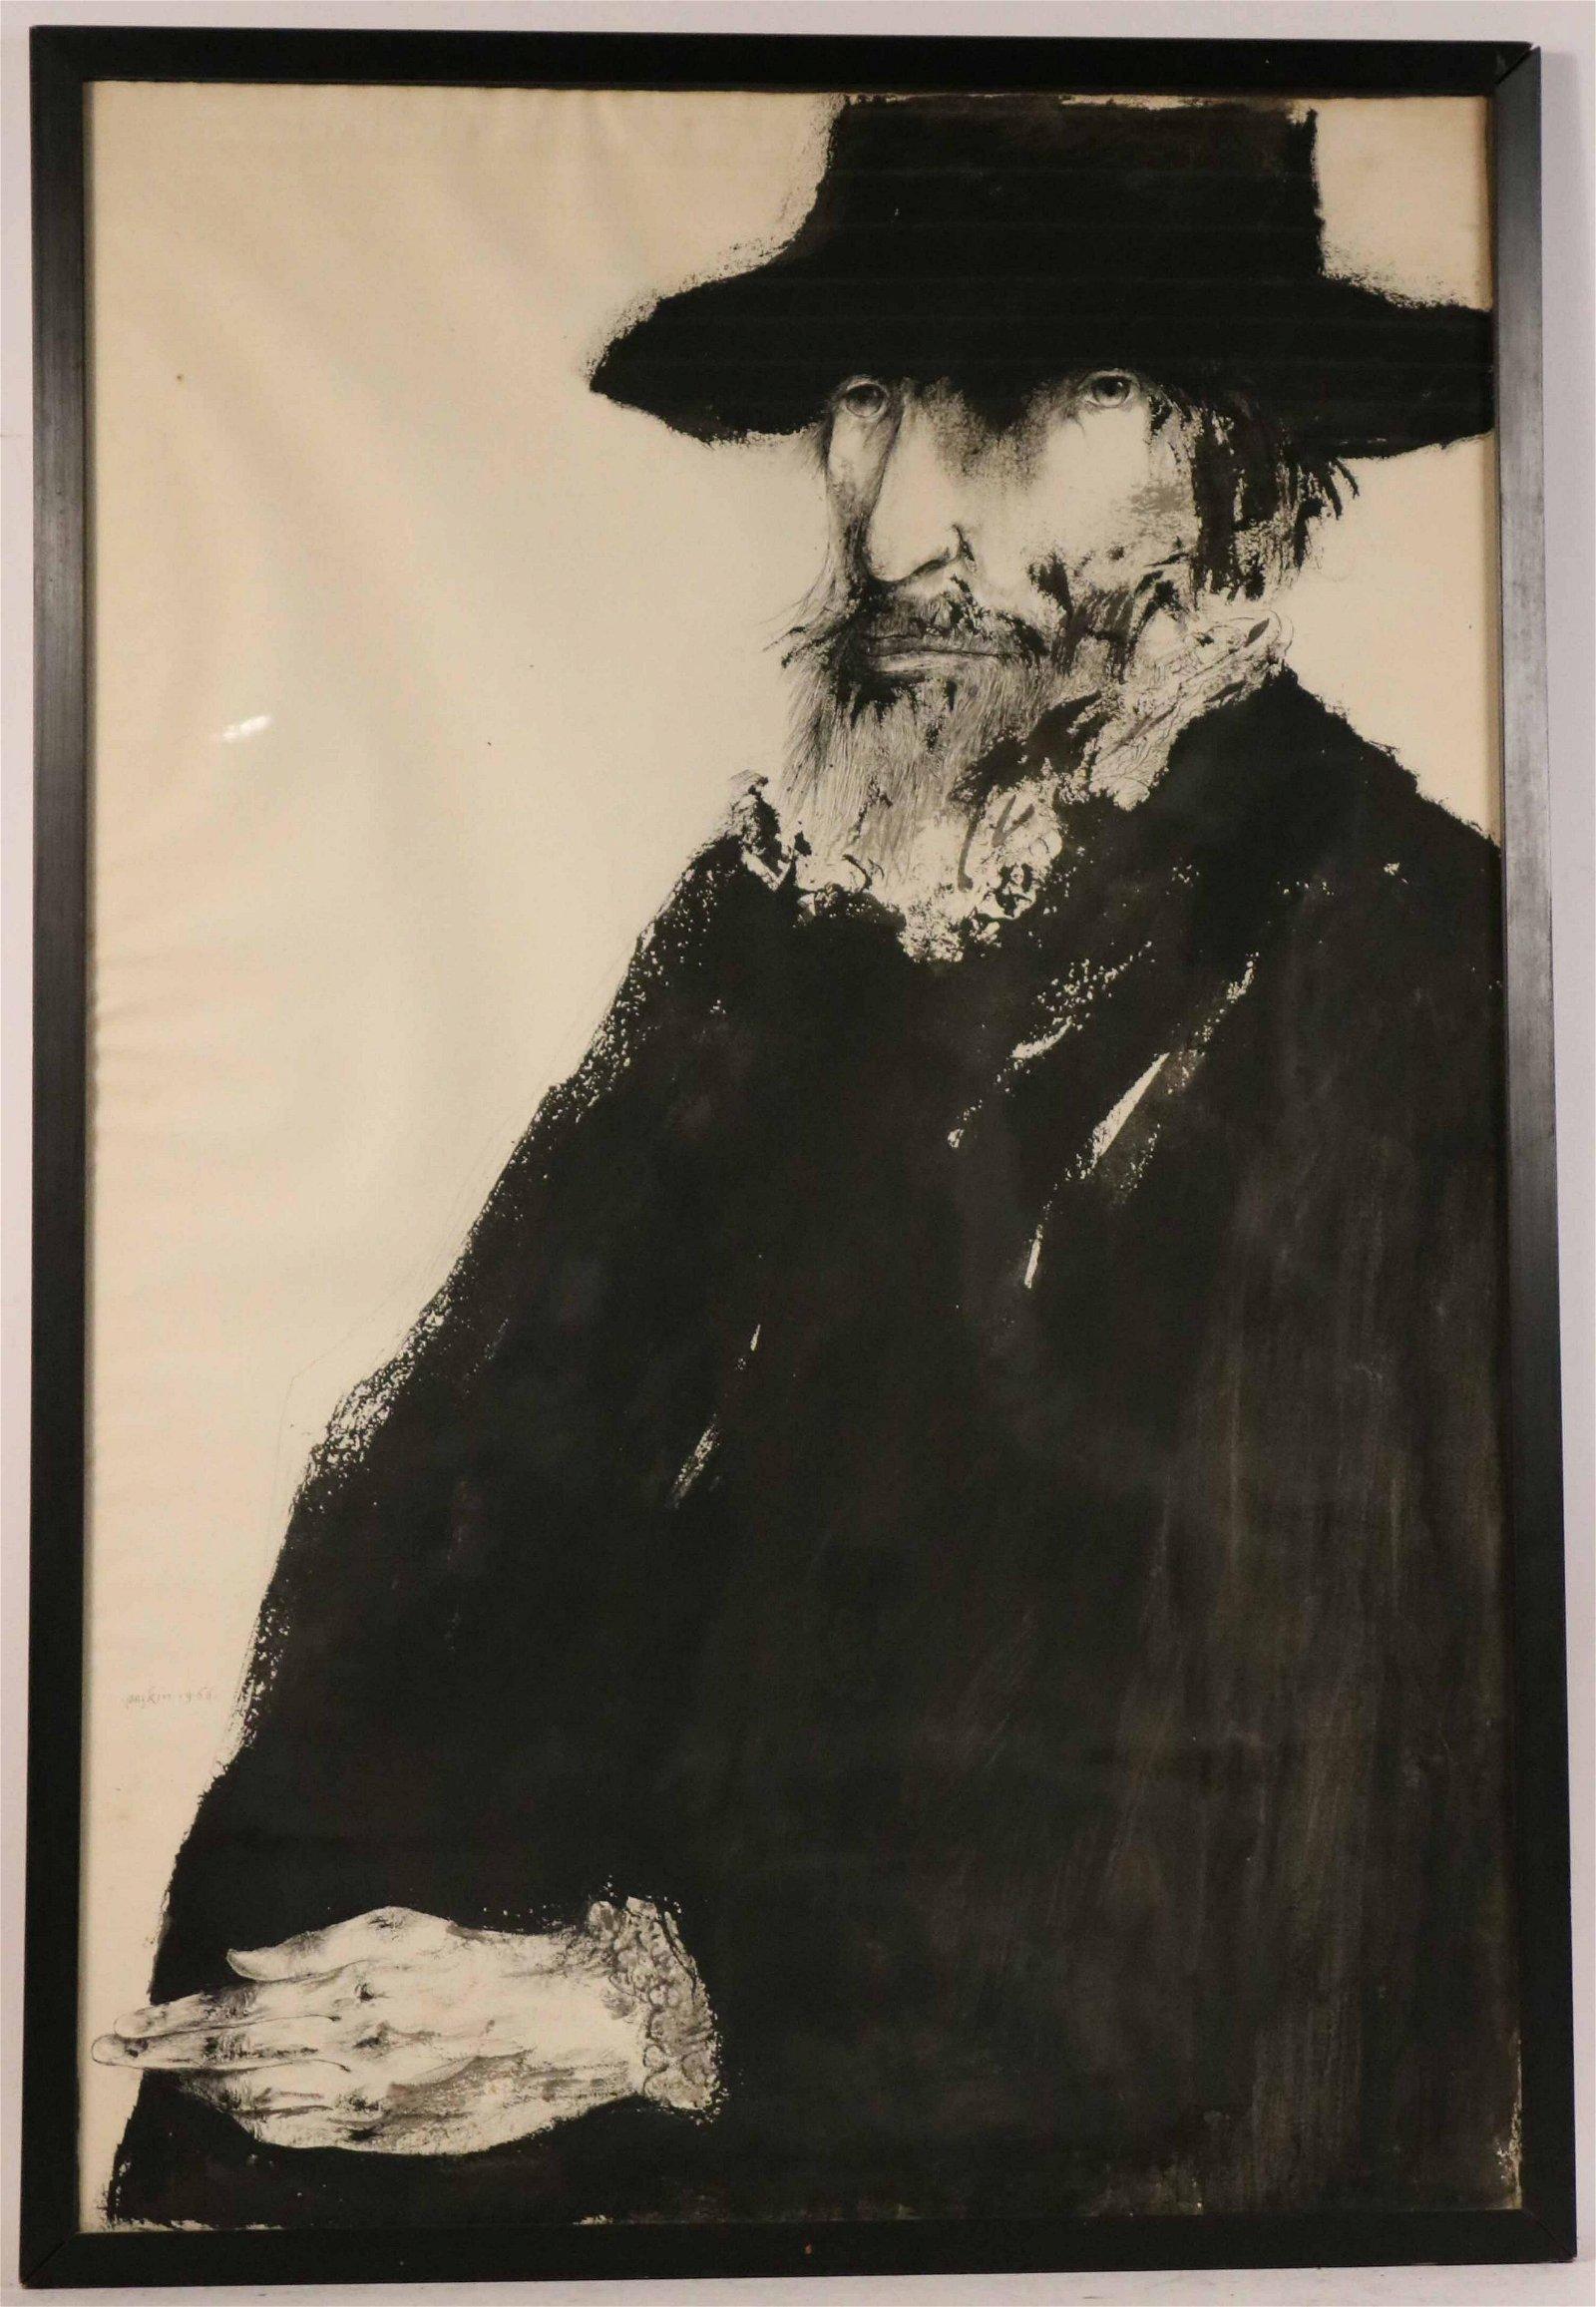 Leonard Baskin, Ink and Wash, Depicting a Man